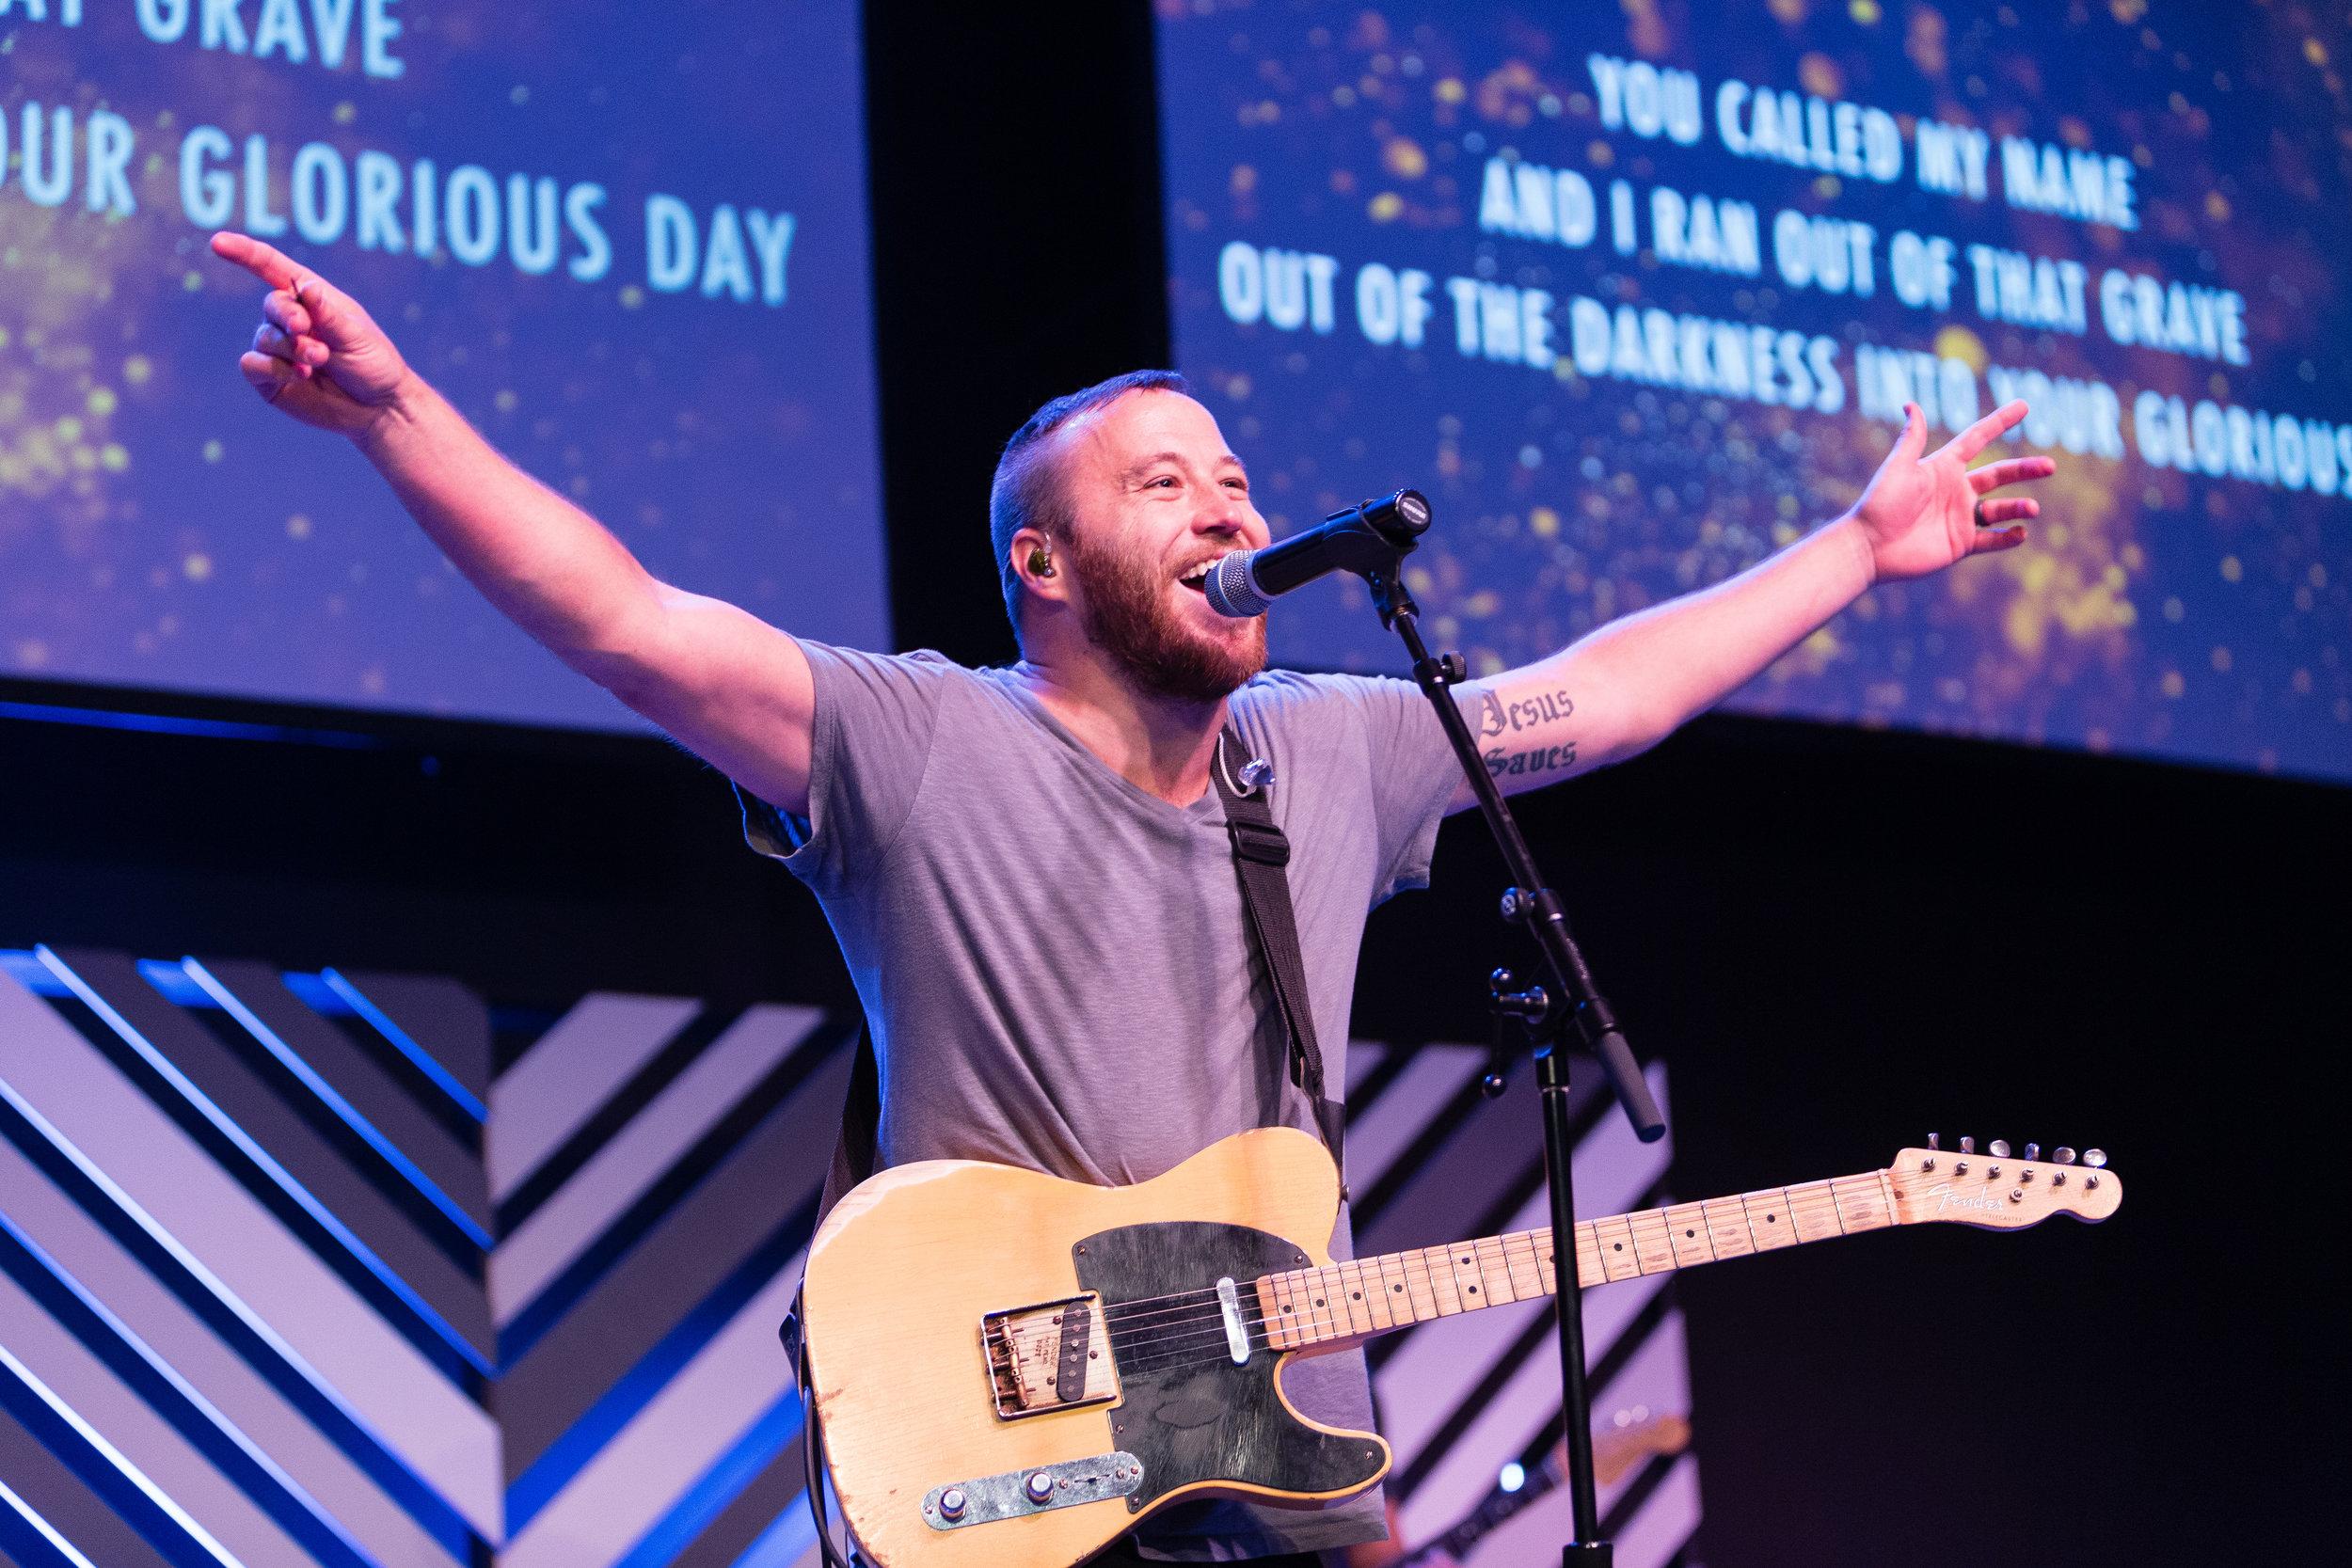 Lifepoint Church Worship